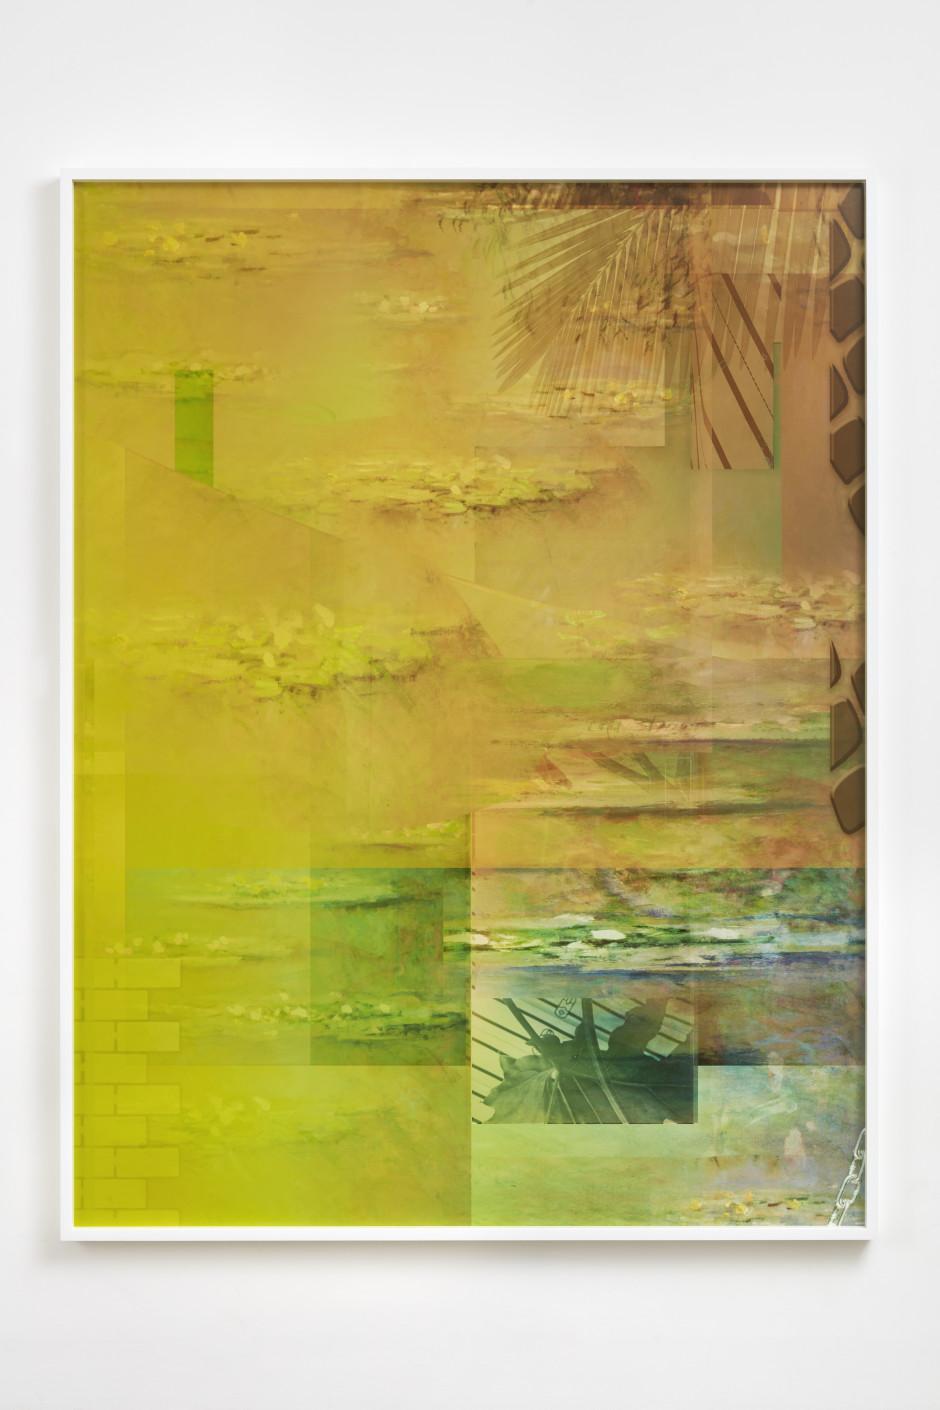 Nymphaea alba, 2018  archival pigment print  205 x 156 x 5.7 cm / 80 ¾ x 61 ⅜ x 2 ¼ in